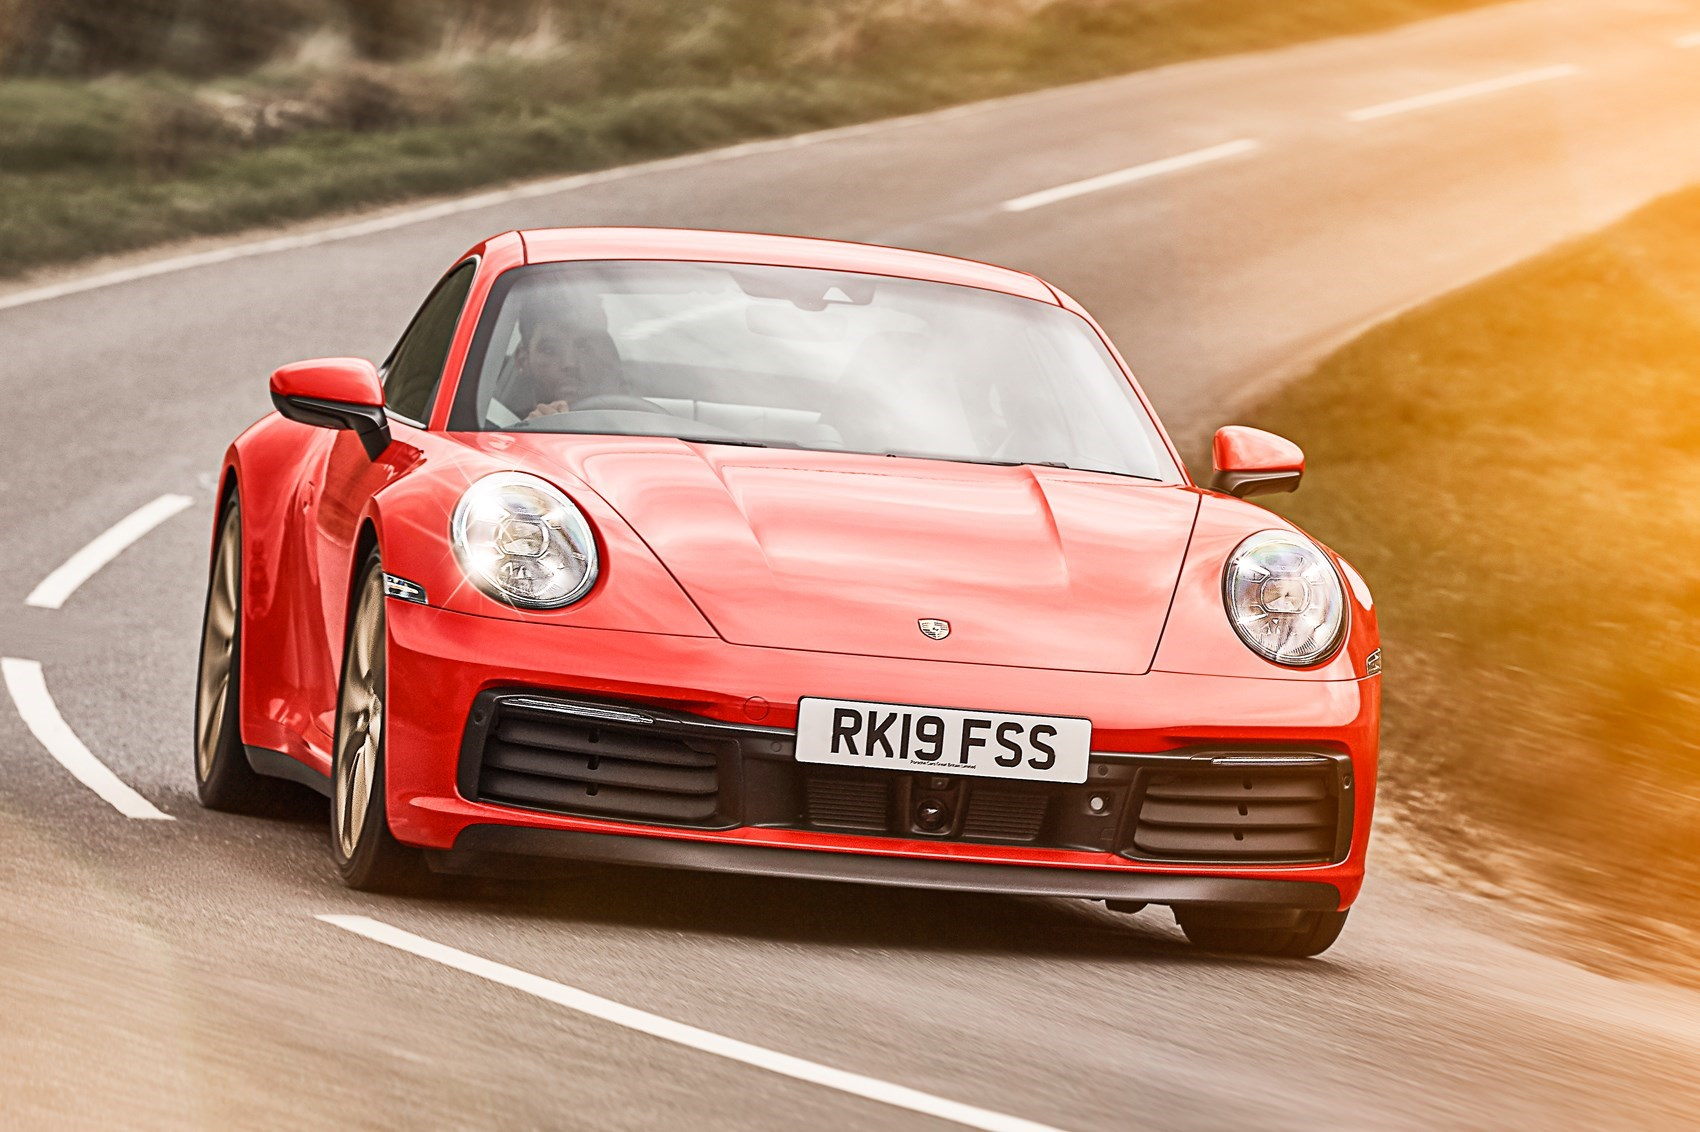 Best sports cars 2019: Porsche 911 vs rivals | CAR Magazine